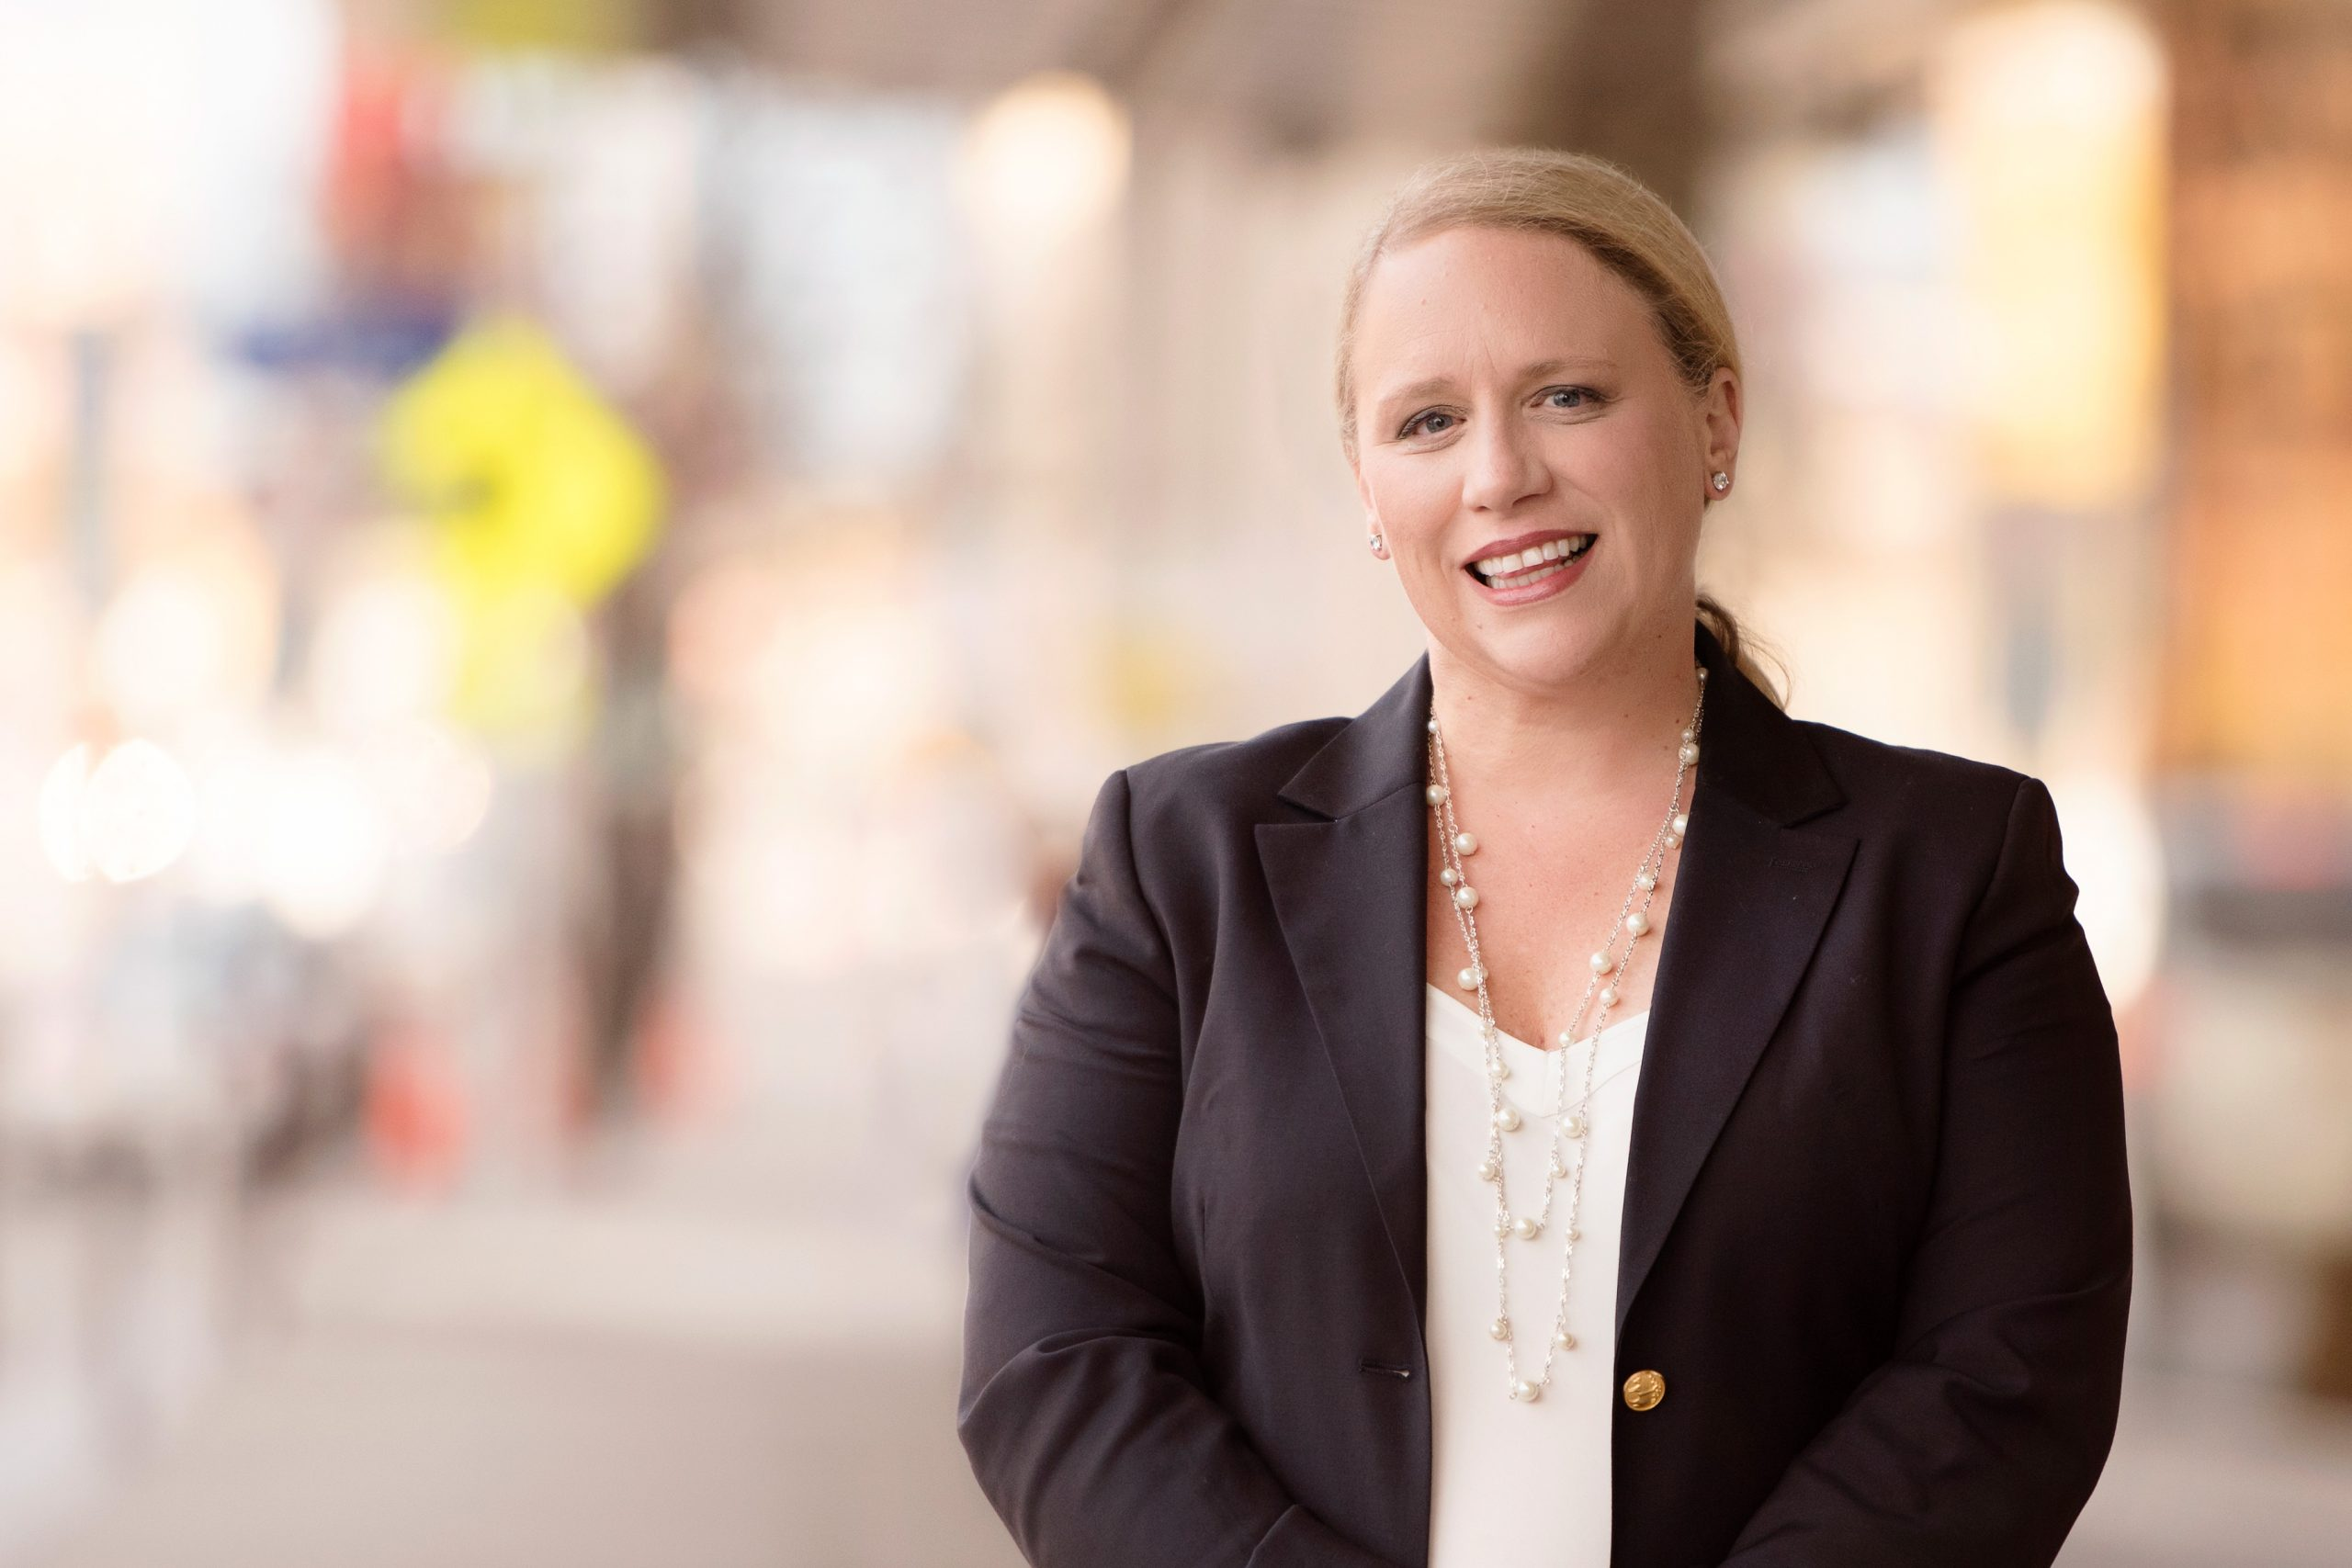 Shealyn McGuire Sullivan, Partner at Barrington Partners